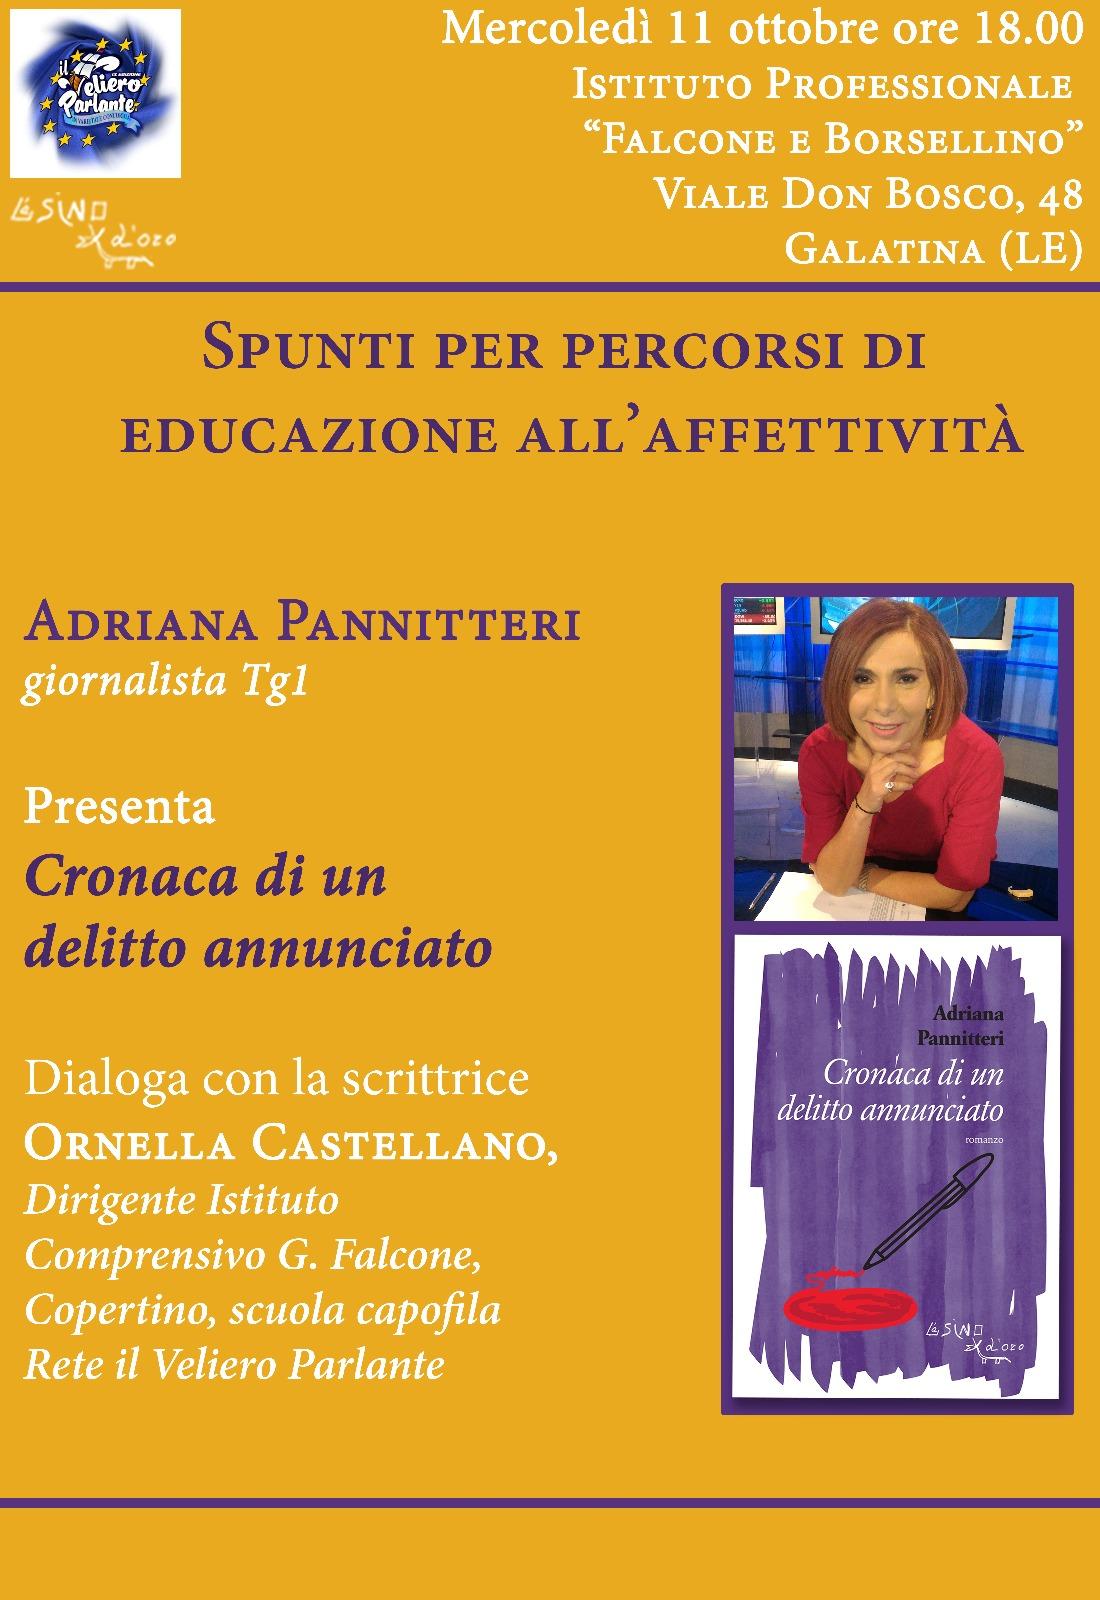 SPUNTI PER PERCORSI DI EDUCAZIONE ALL'AFFETTIVITA'